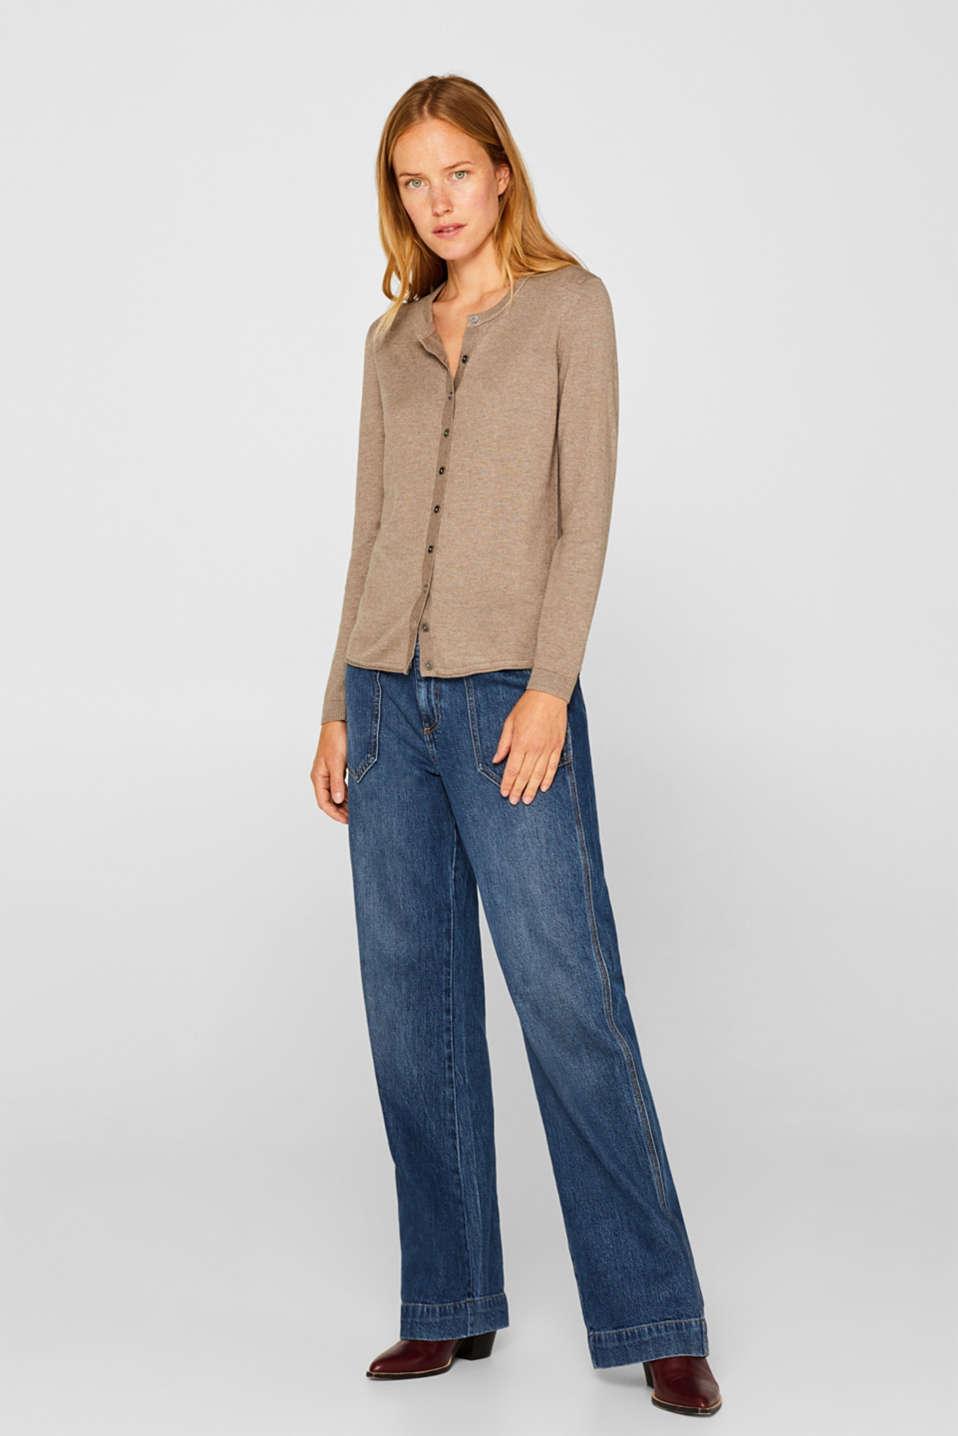 Basic fine knit cardigan, TAUPE 5, detail image number 5